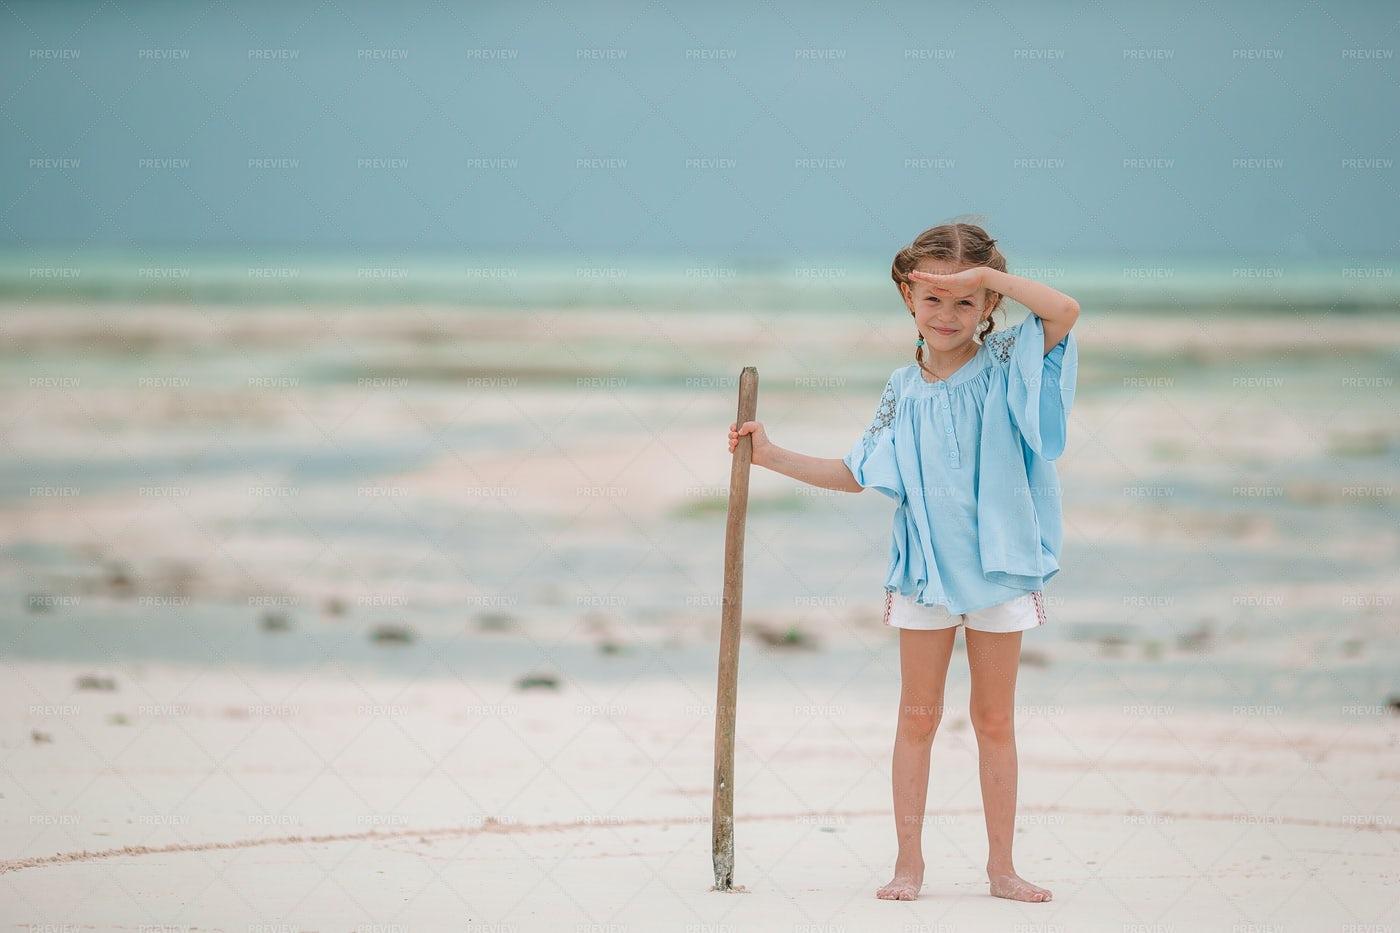 Little Girl At Beach: Stock Photos